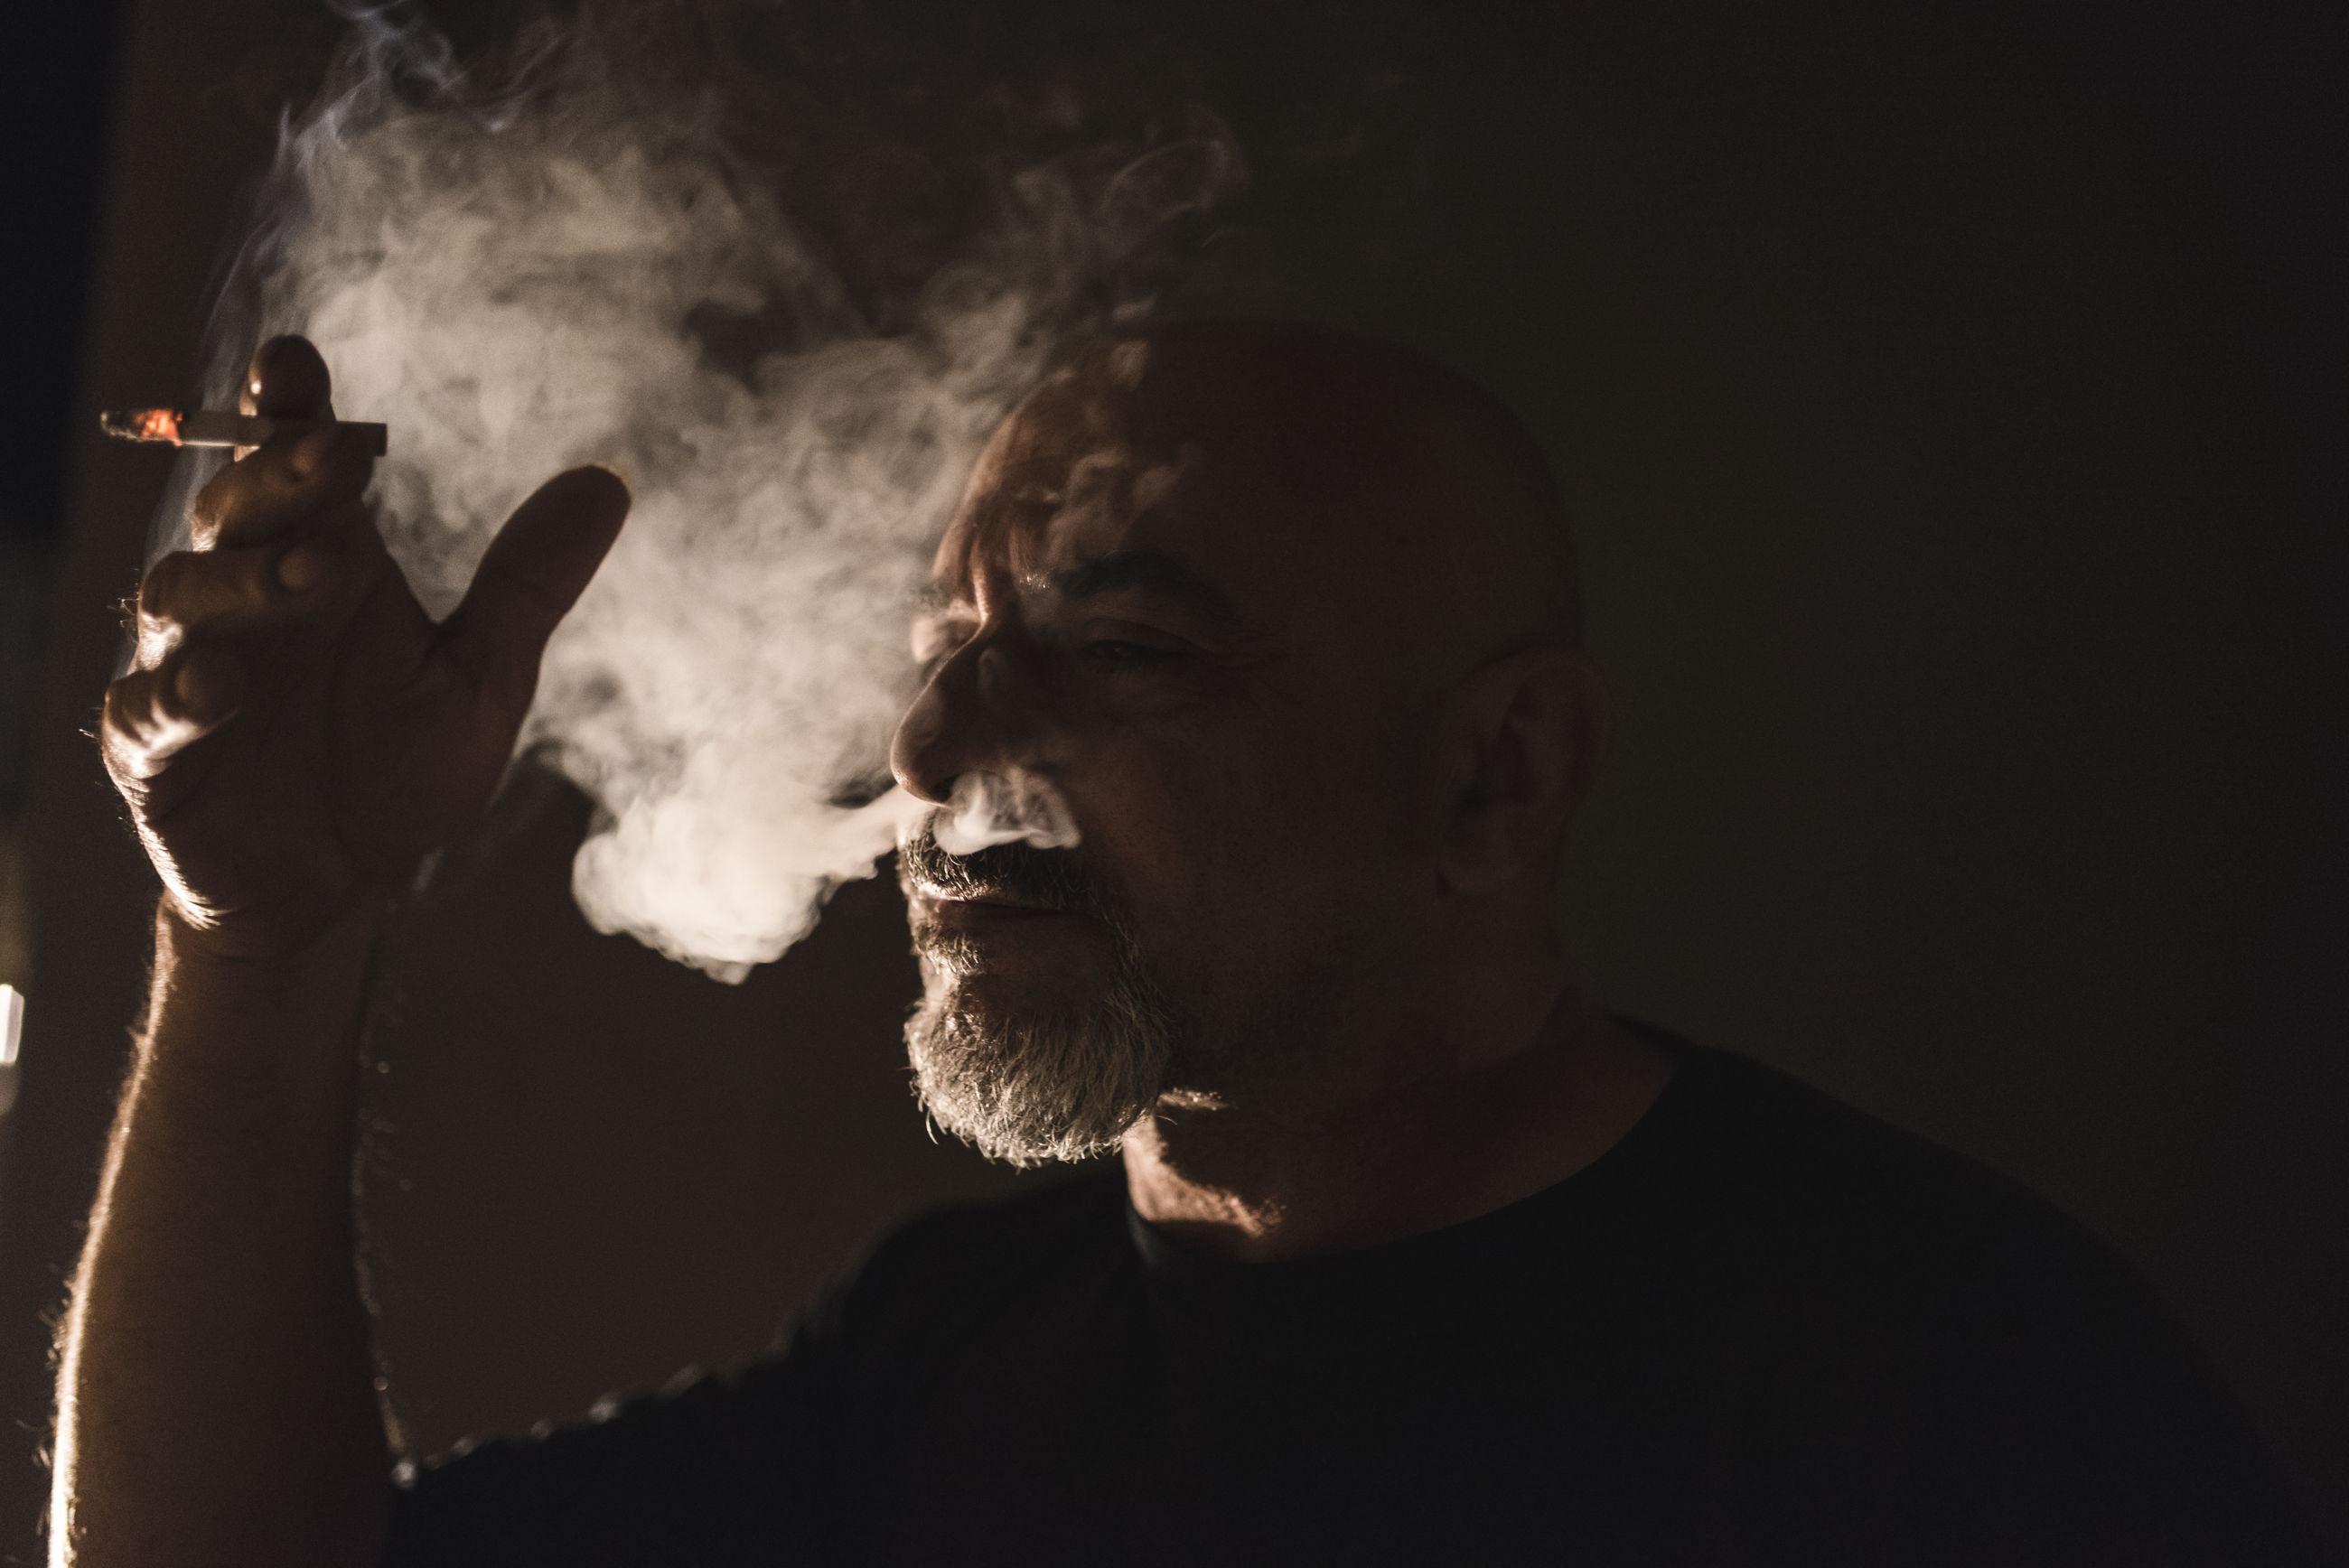 Mature man smoking cigarette at home